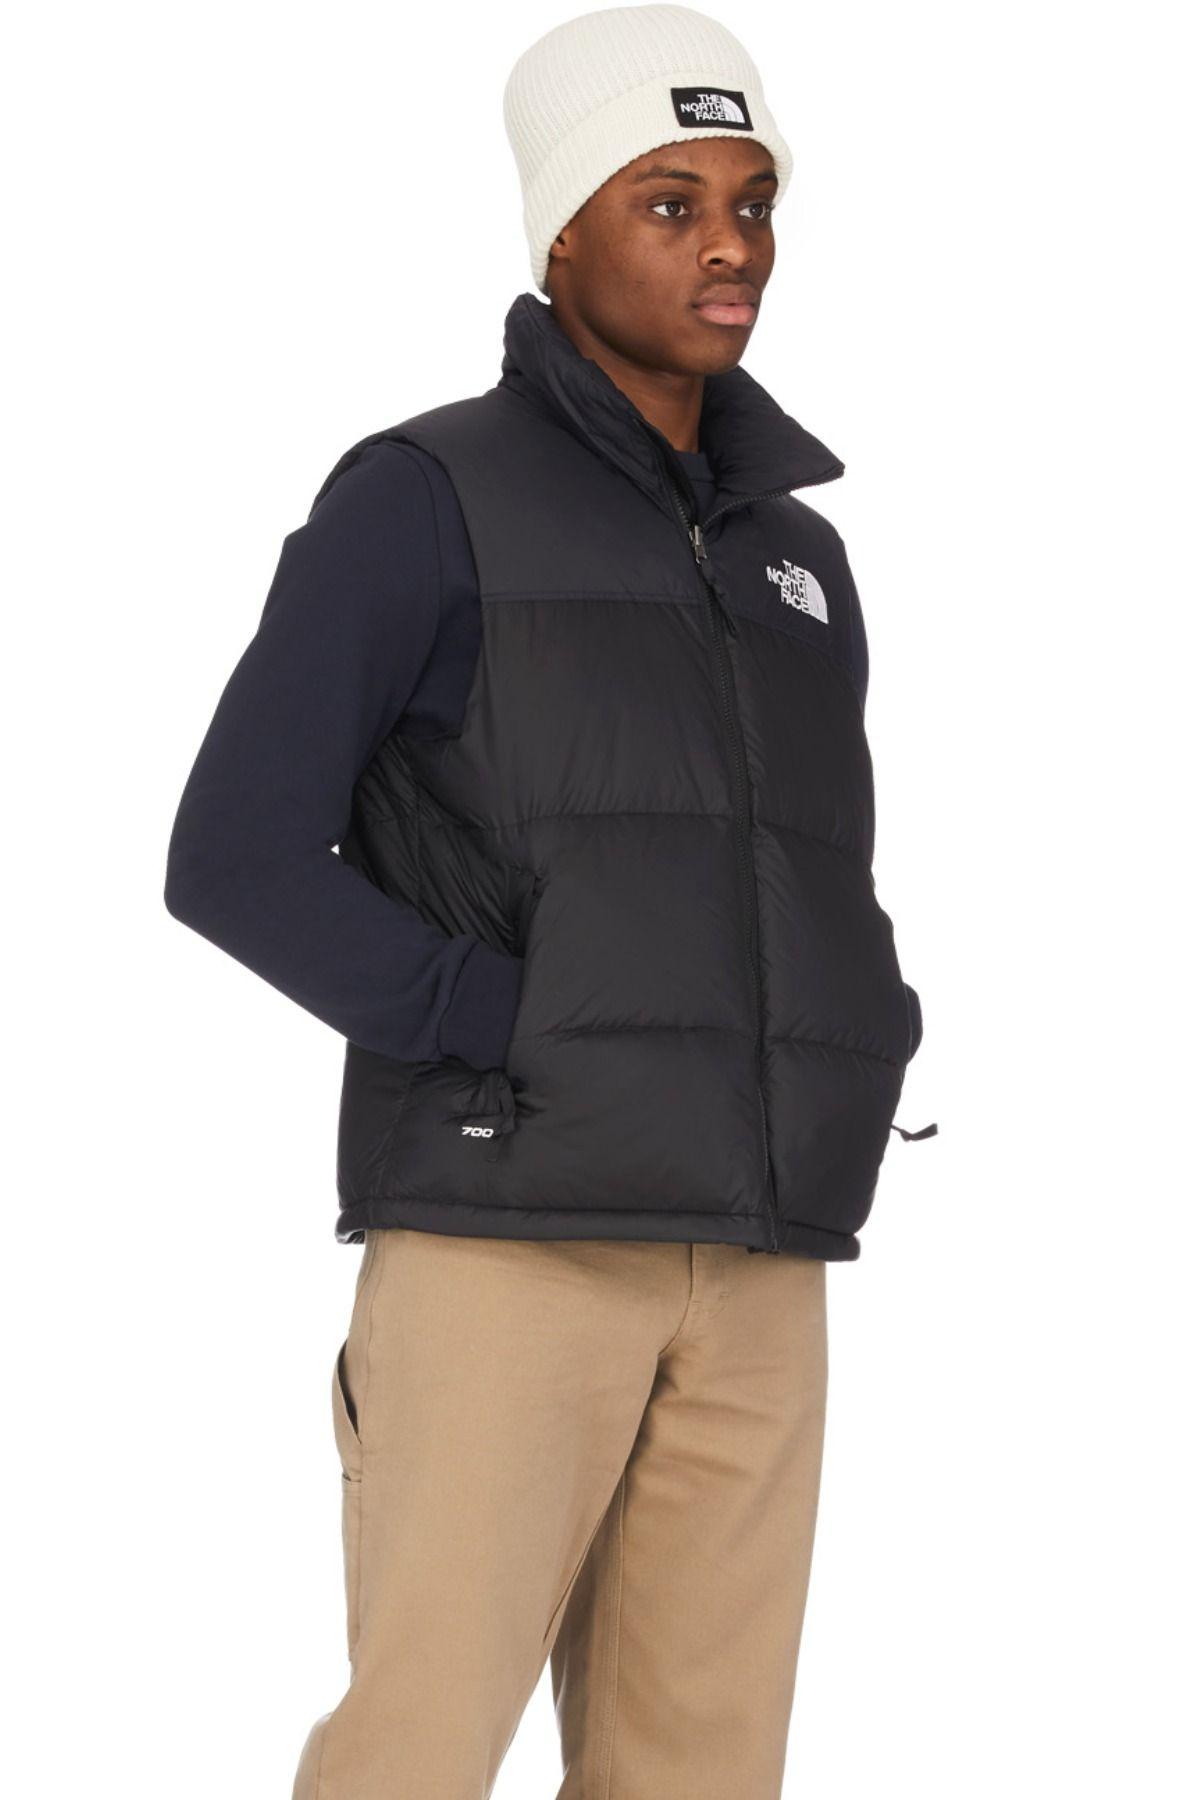 The North Face 1996 Retro Nuptse Vest Tnf Black North Face Puffer Jacket Jacket Outfits The North Face Puffer Jacket [ 1800 x 1200 Pixel ]